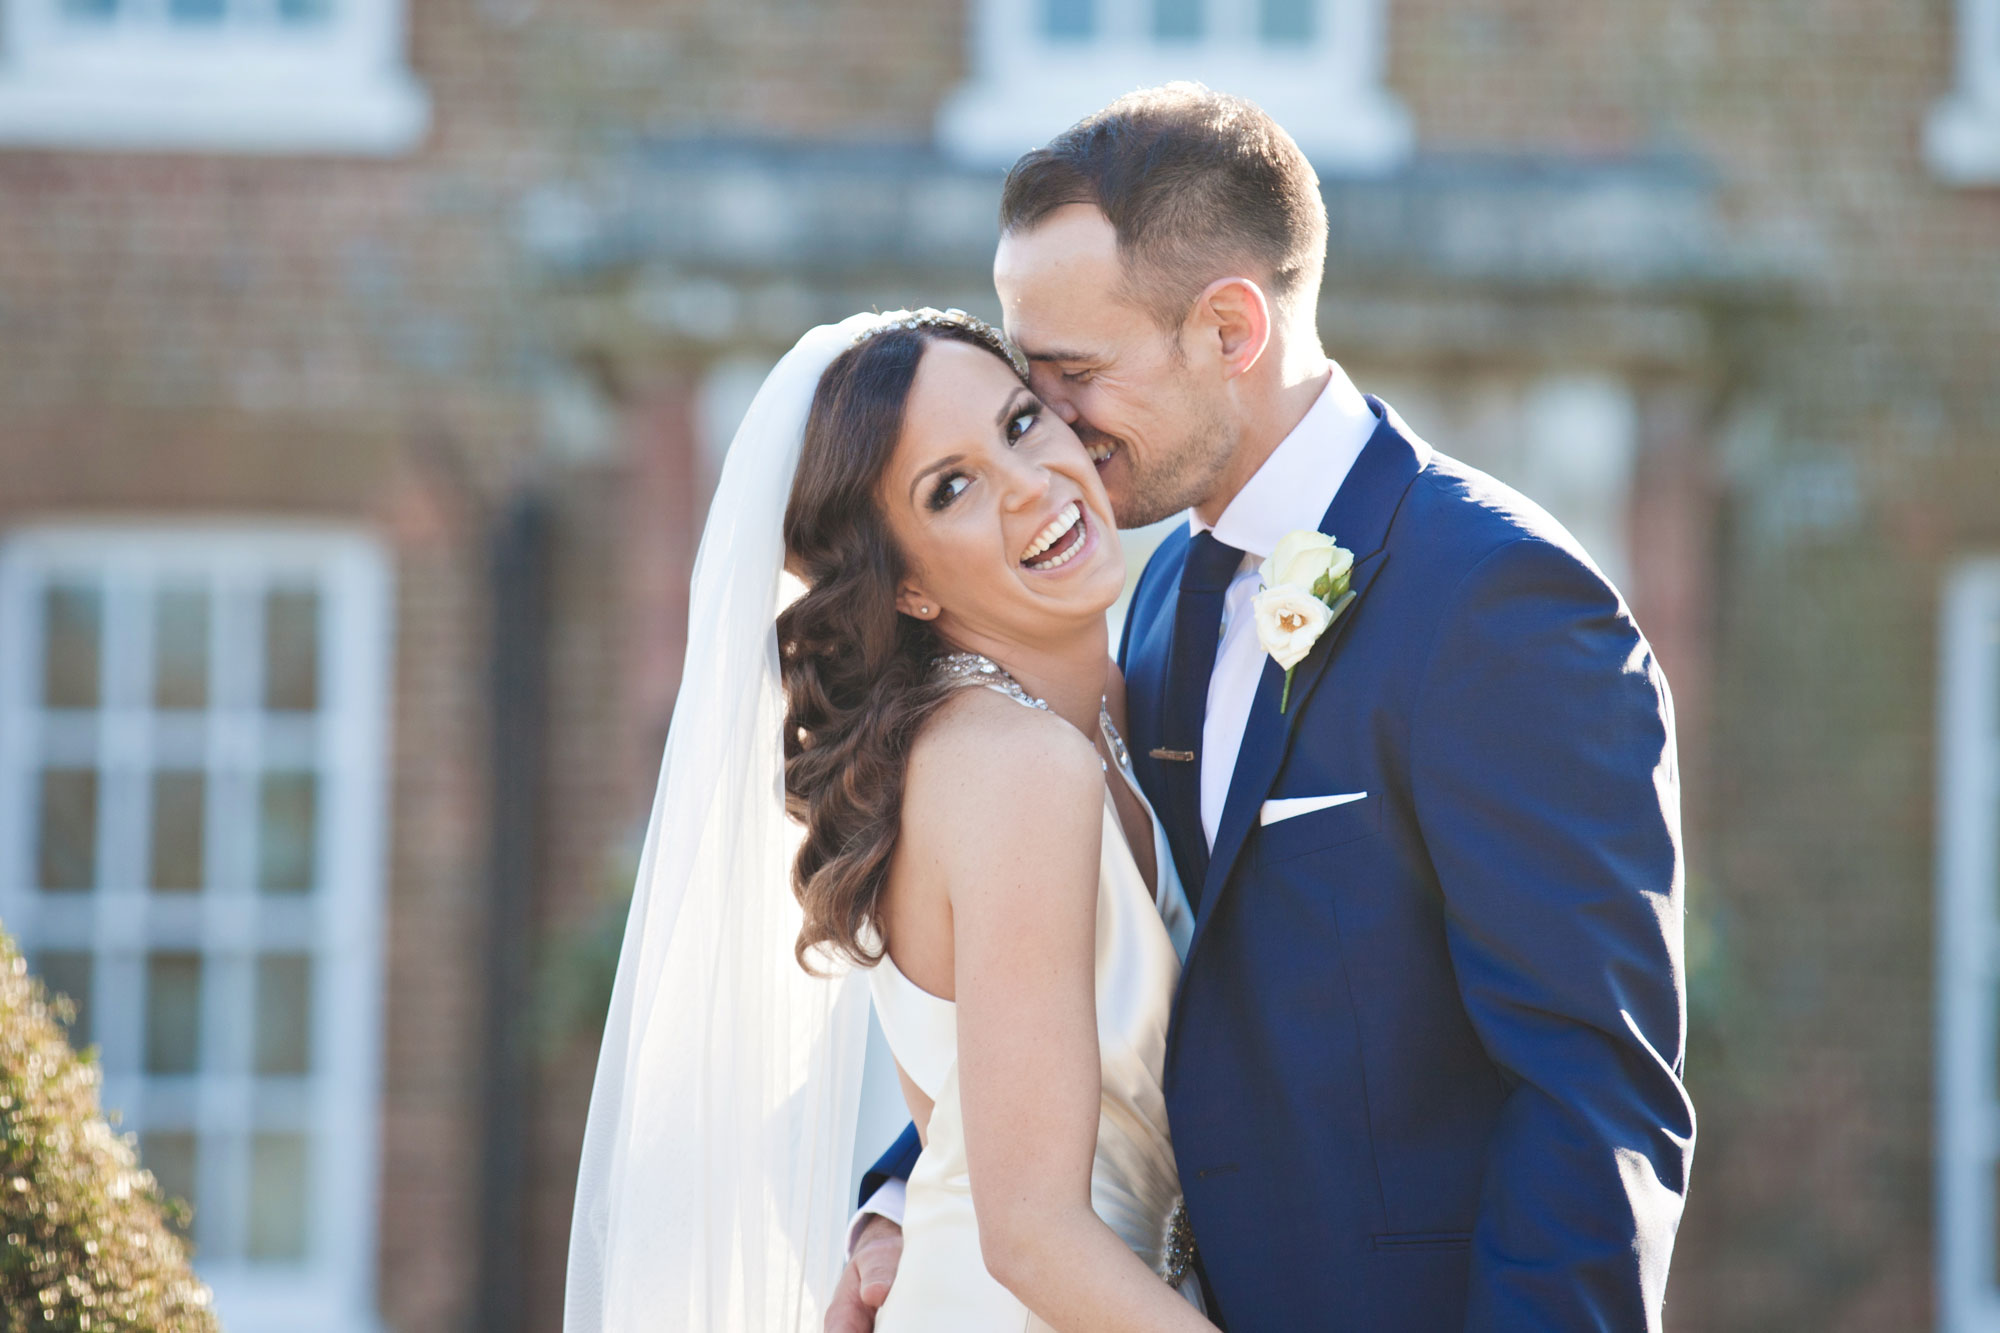 chilston park wedding jenny packham bride kent